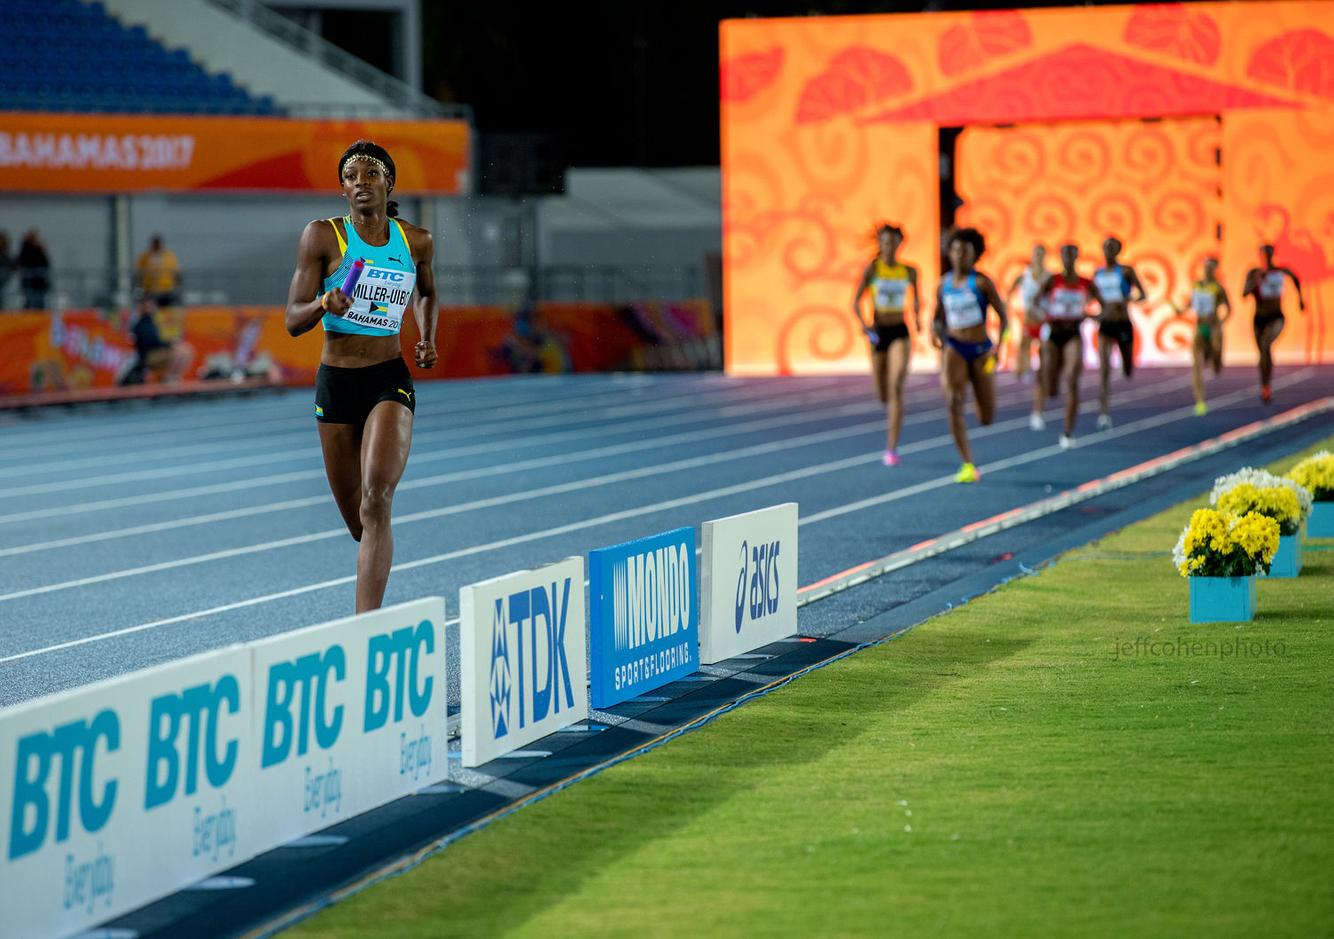 1r2017_bahamas_relays_day_2_shaunae_miller_uibo_4x400_mixed___jeff_cohen_photo__3760_web.jpg